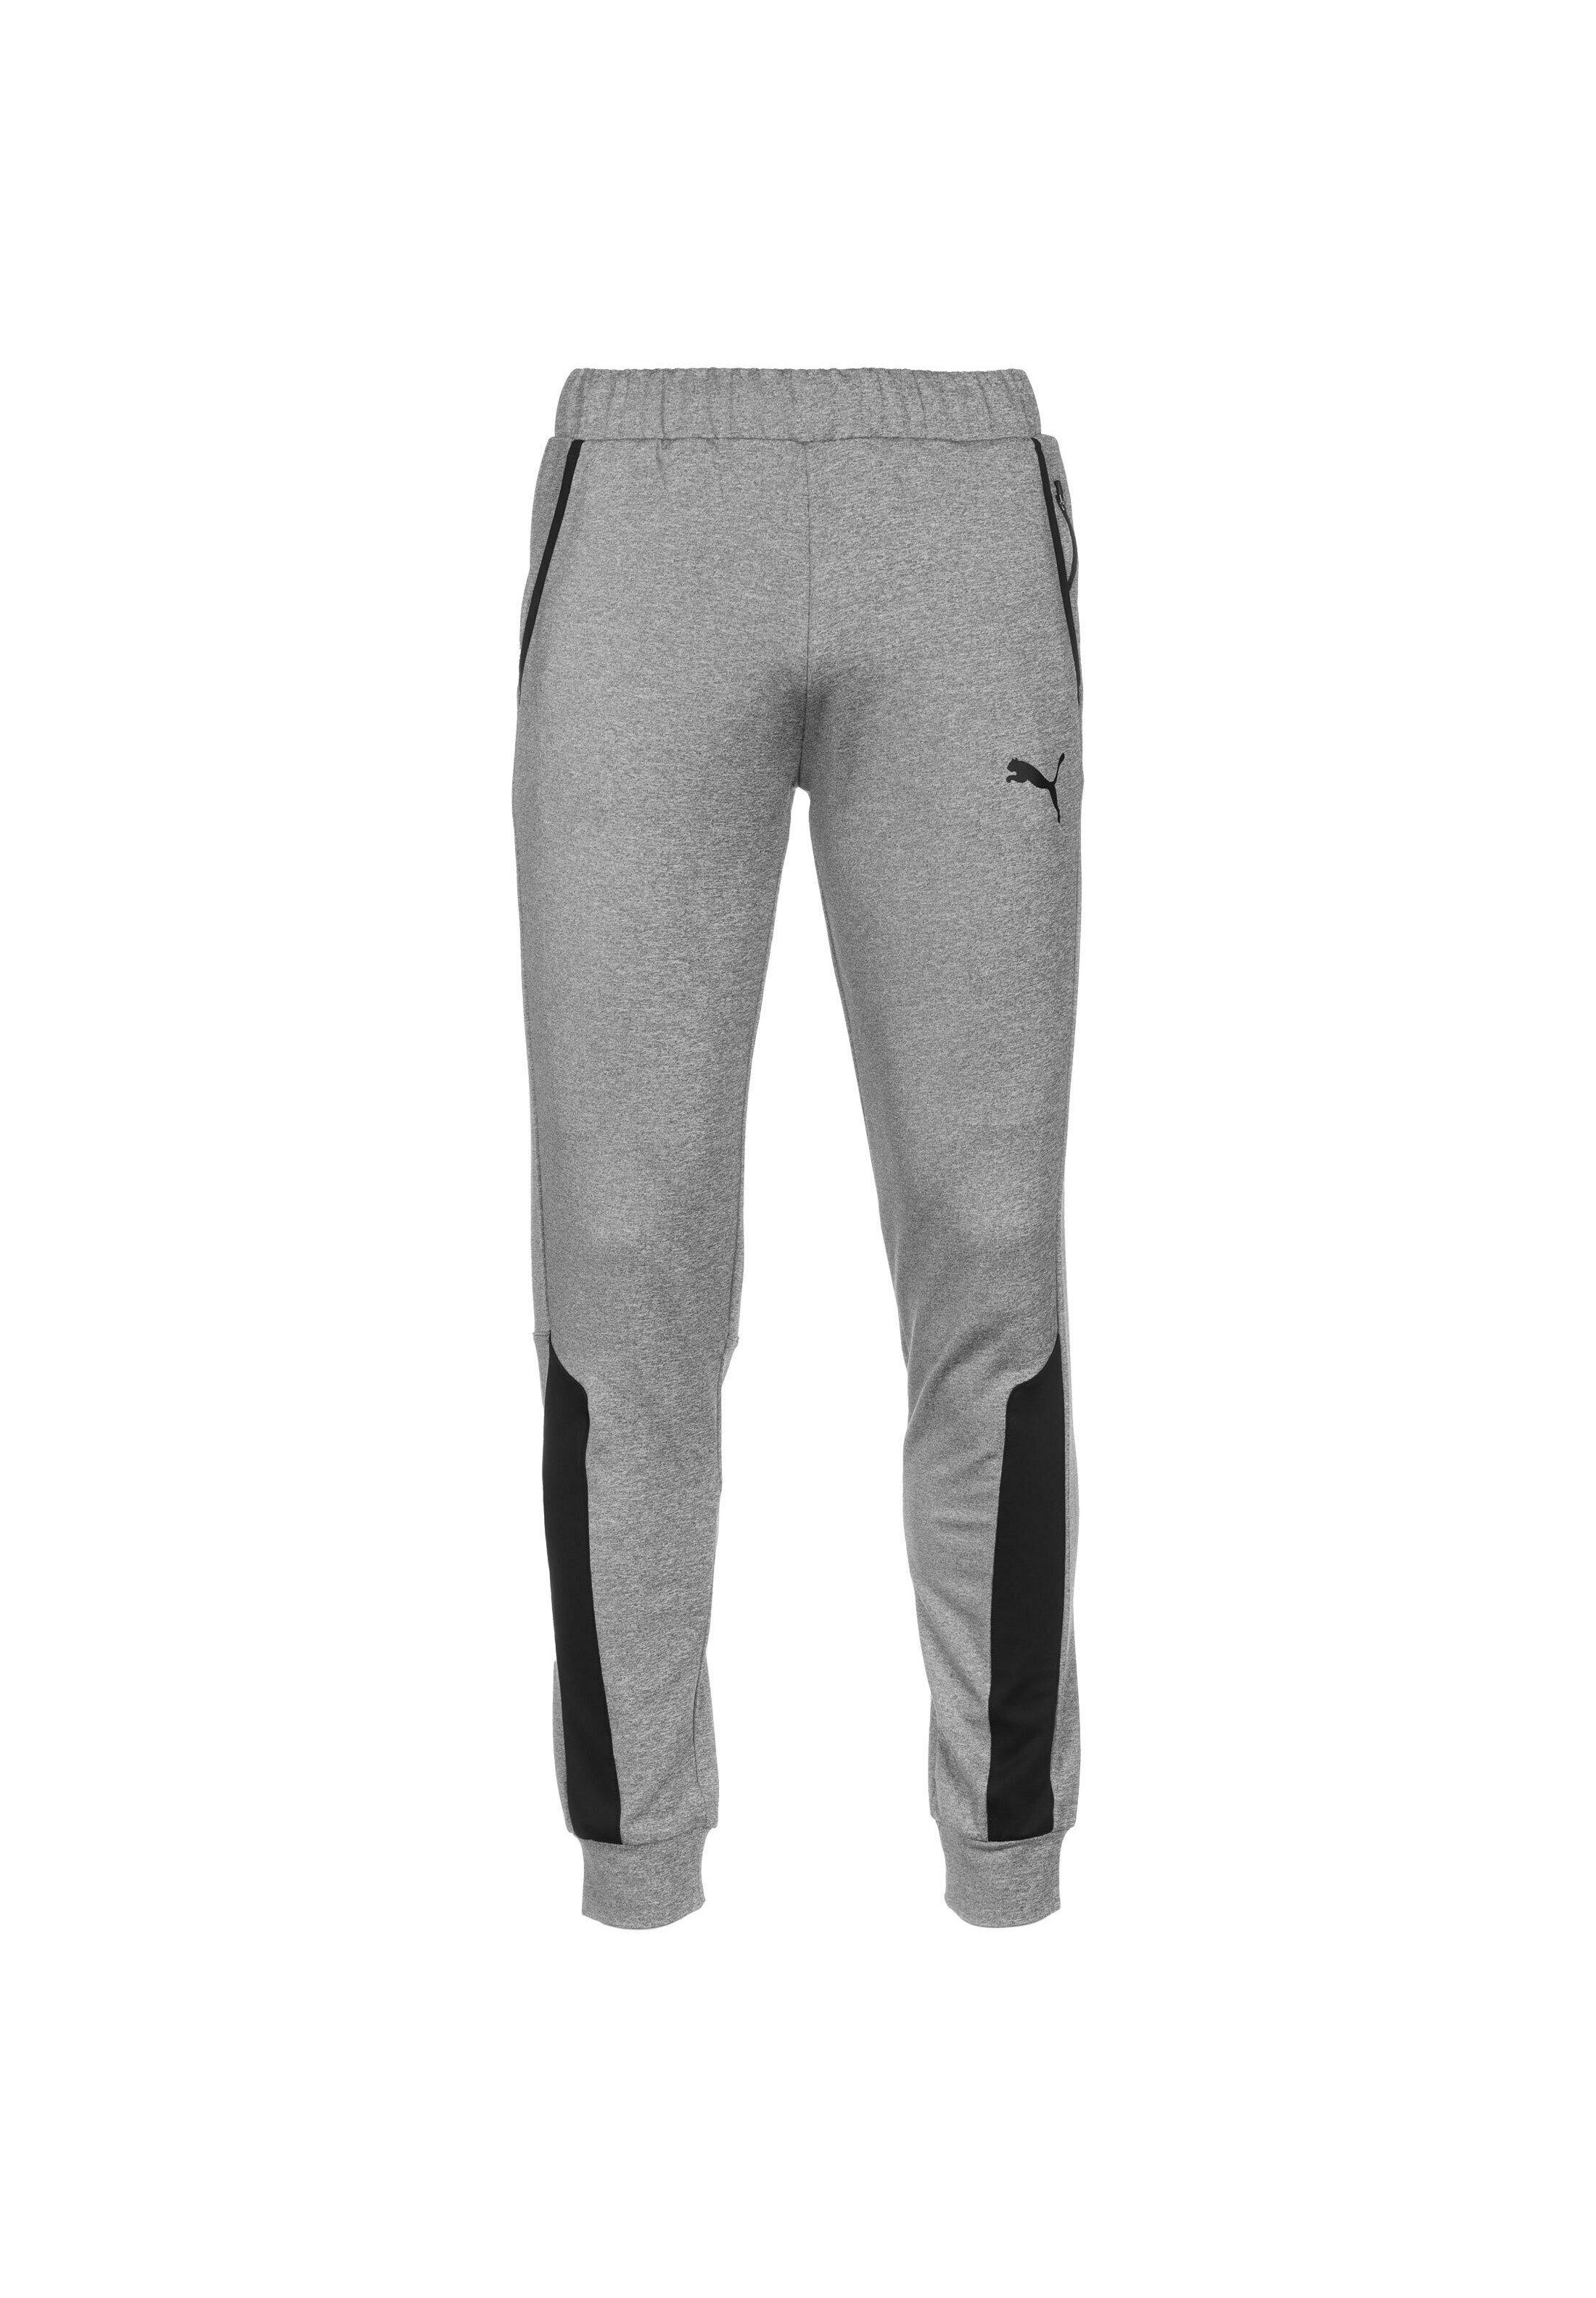 Herren Jogginghose - gray